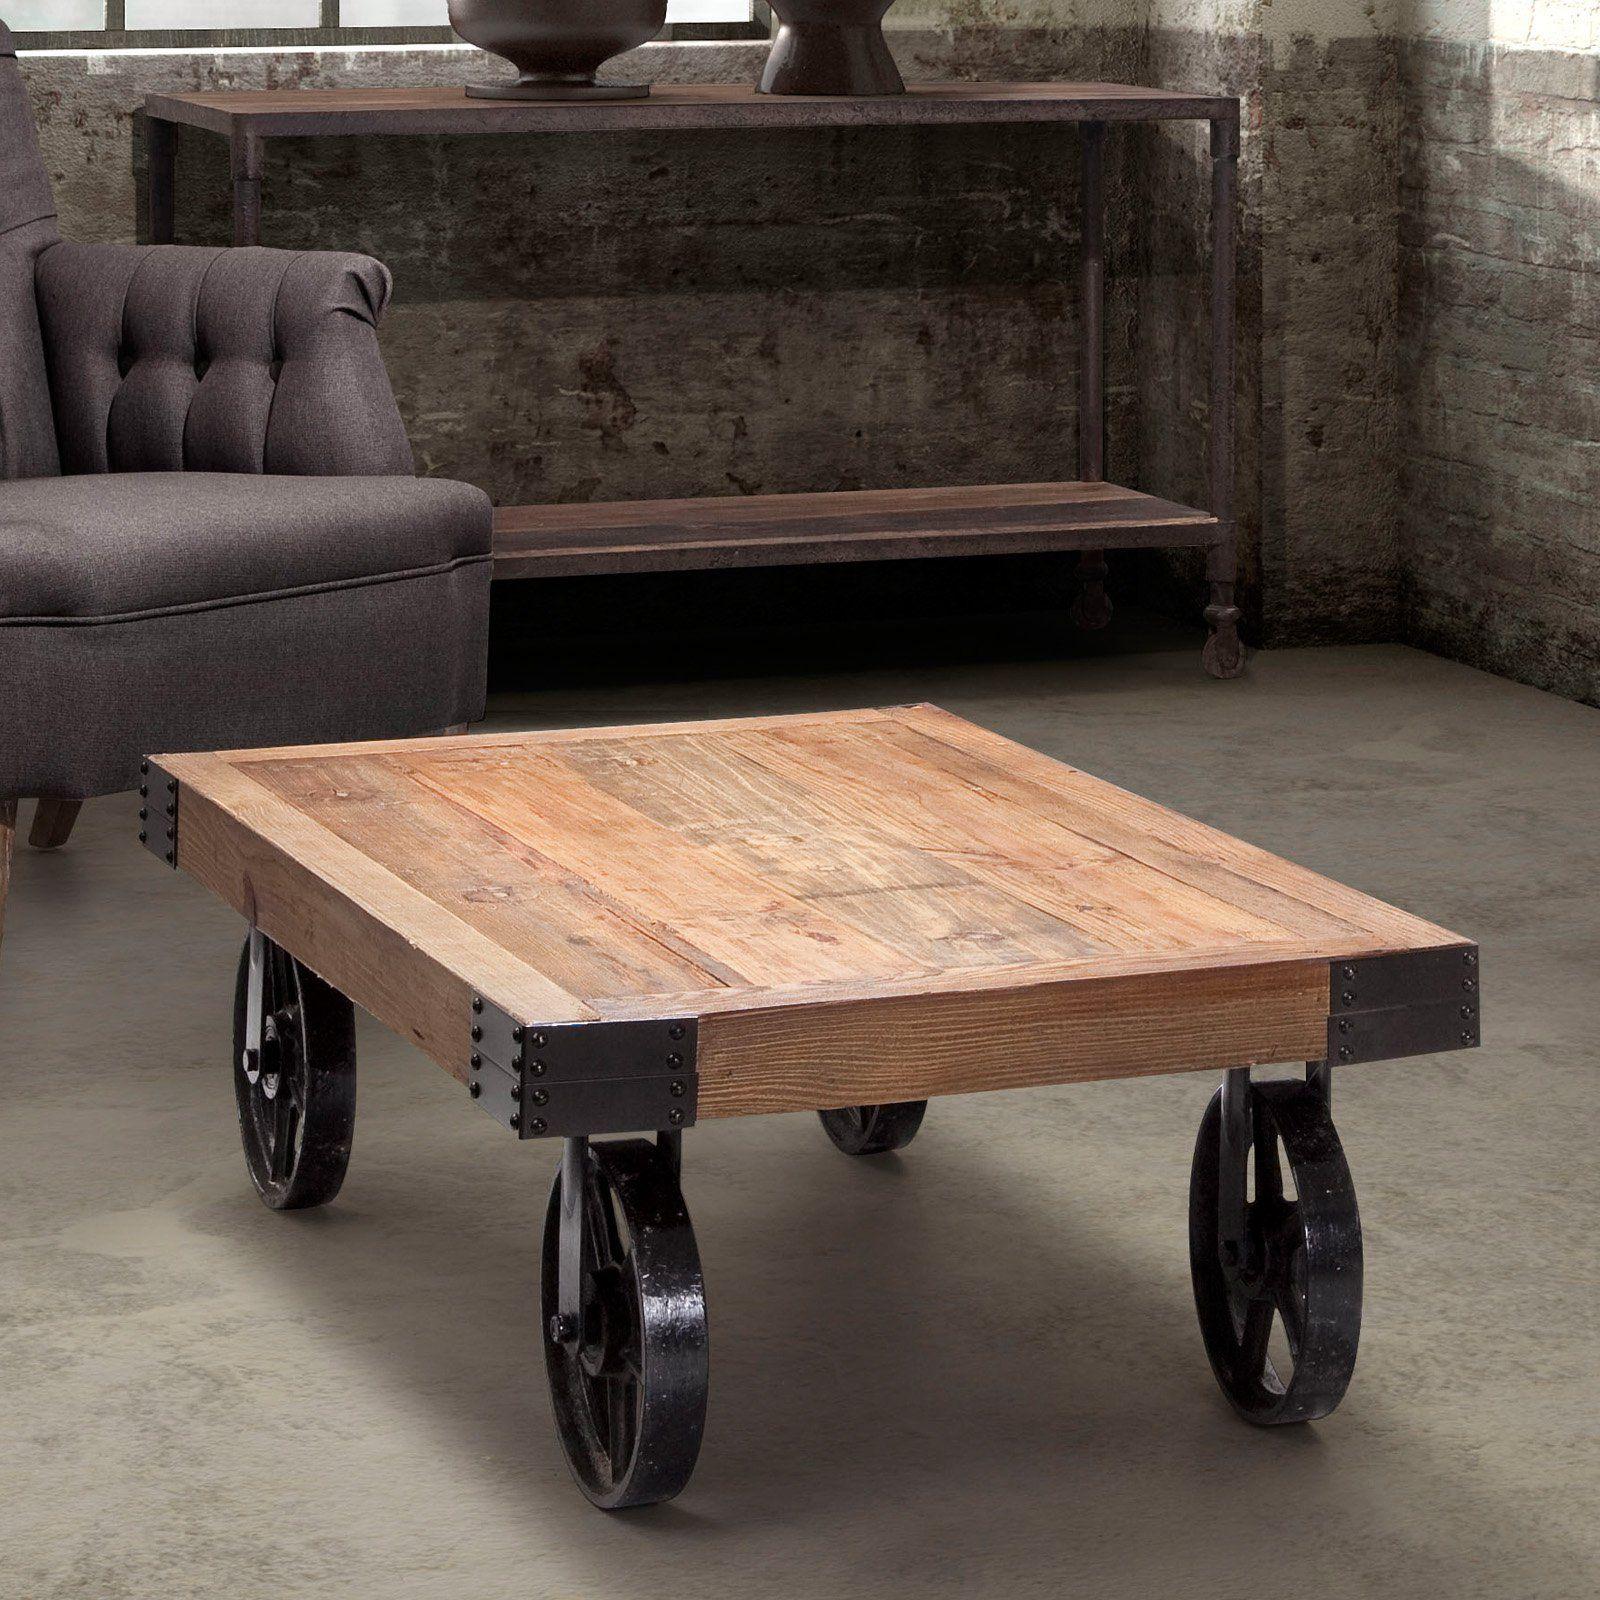 0d3511e0f2adad3d0df0c5b26071fdc0 Meilleur De De Table Basse Bois Moderne Concept